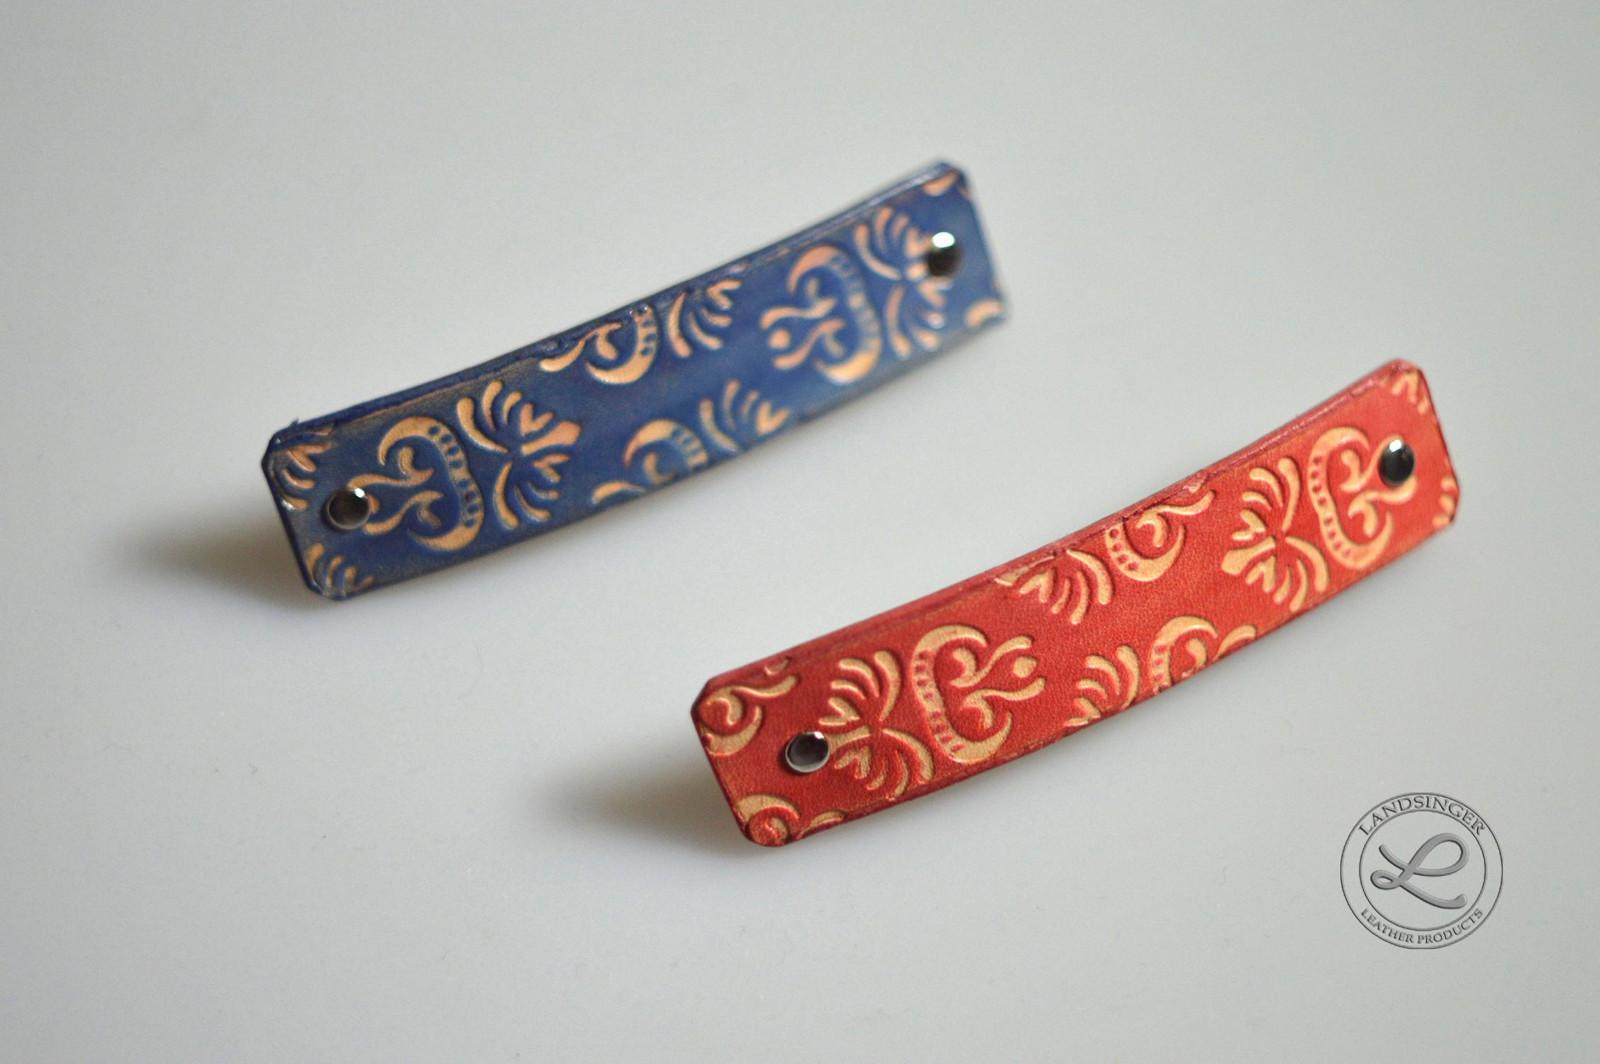 20fd6aca409 Kožená spona do vlasů - retro (menší spona 7x2 cm)   Zboží prodejce Kožené  výrobky Landsinger